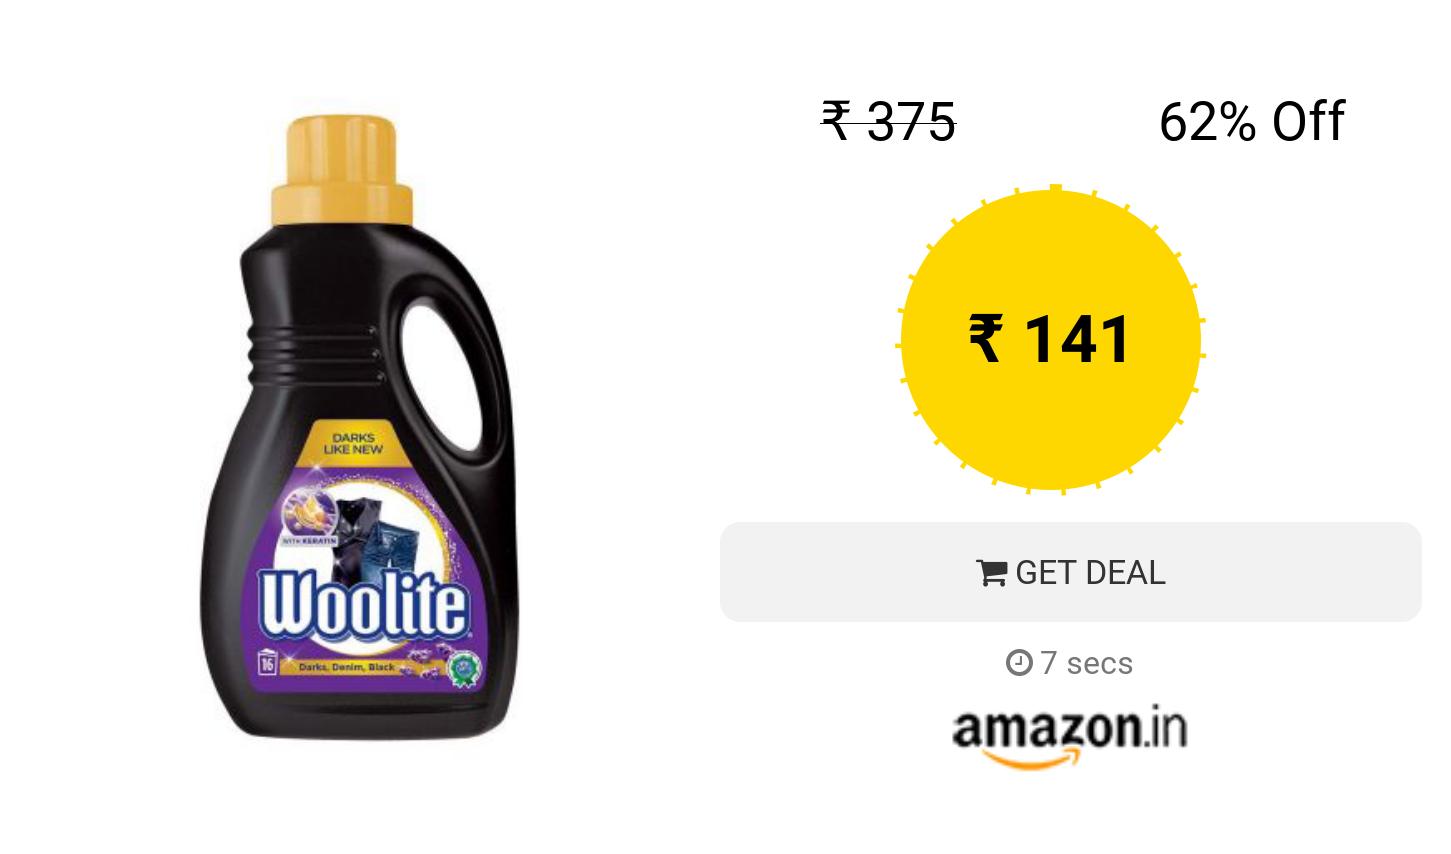 Woolite Laundry Liquid Detergent 1 L Darks Laundry Liquid